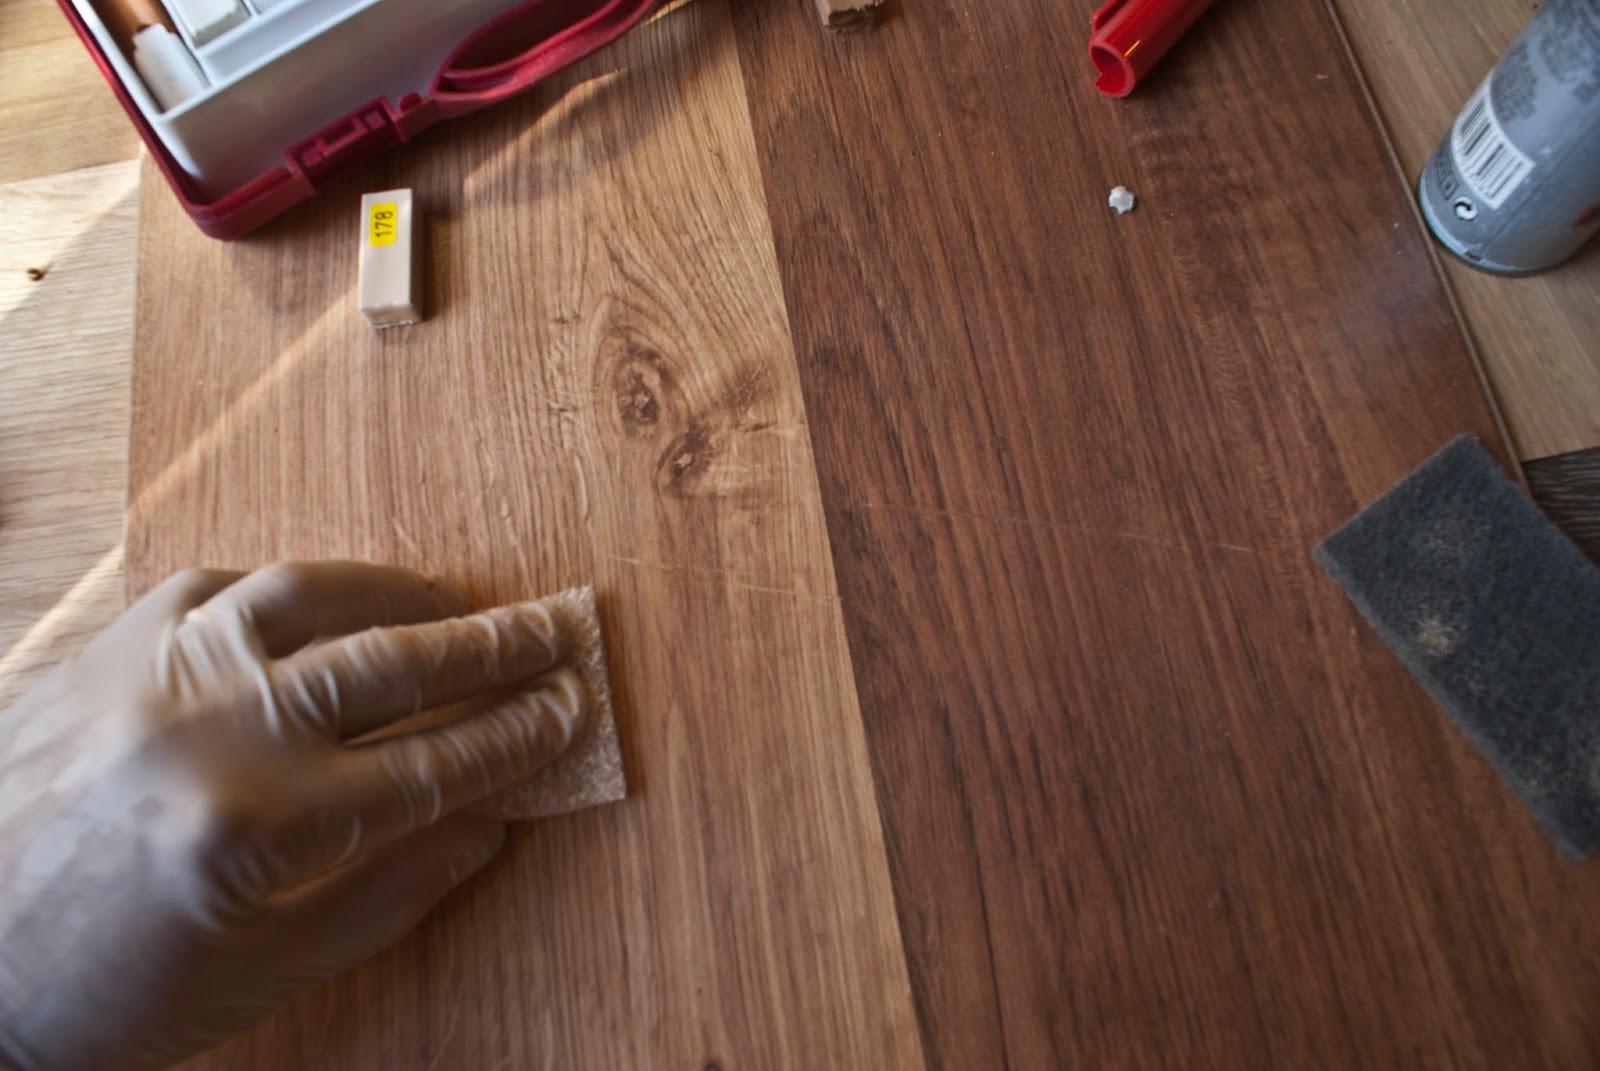 Reparar parquet flotante reparar parquet flotante for Como reparar parquet desgastado